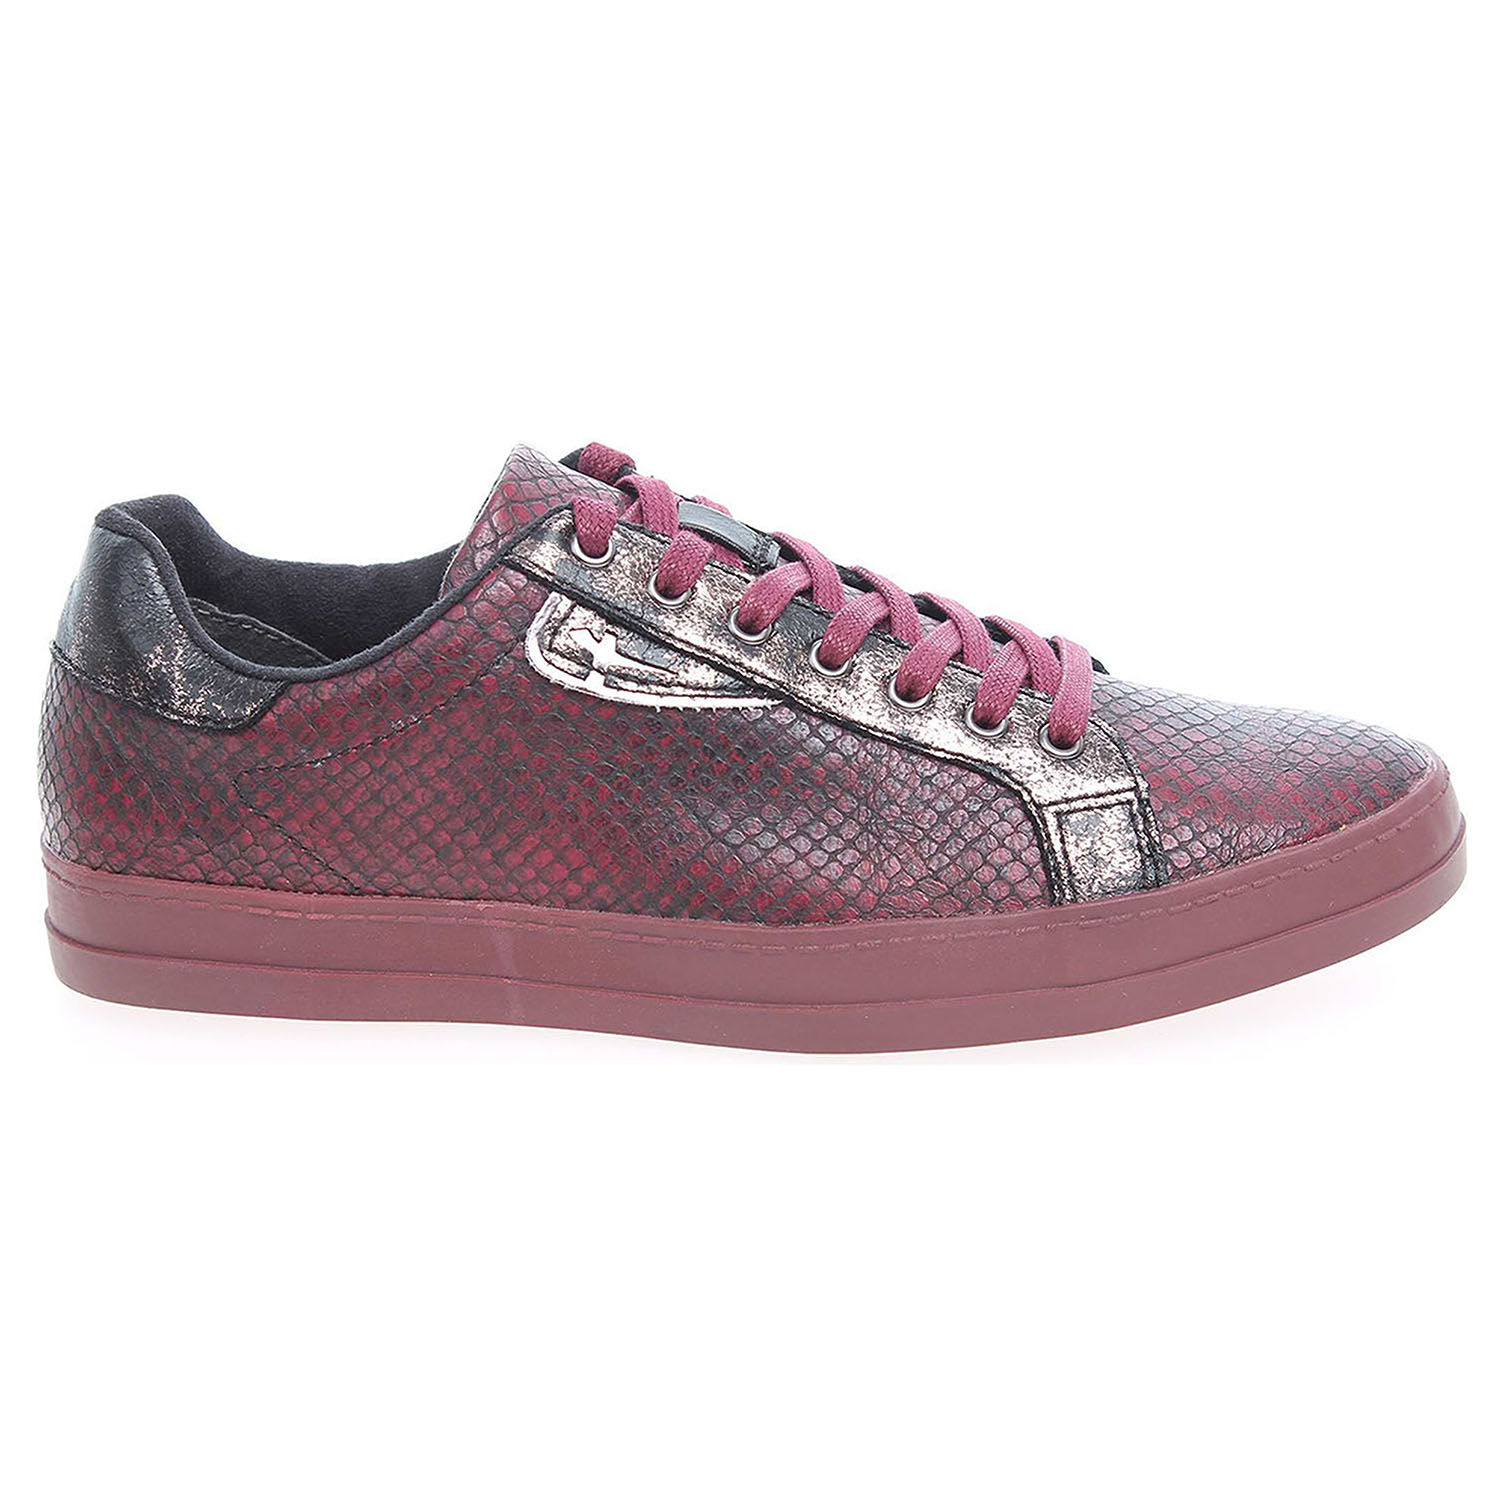 Tamaris dámská obuv 1-23606-27 vínová 43